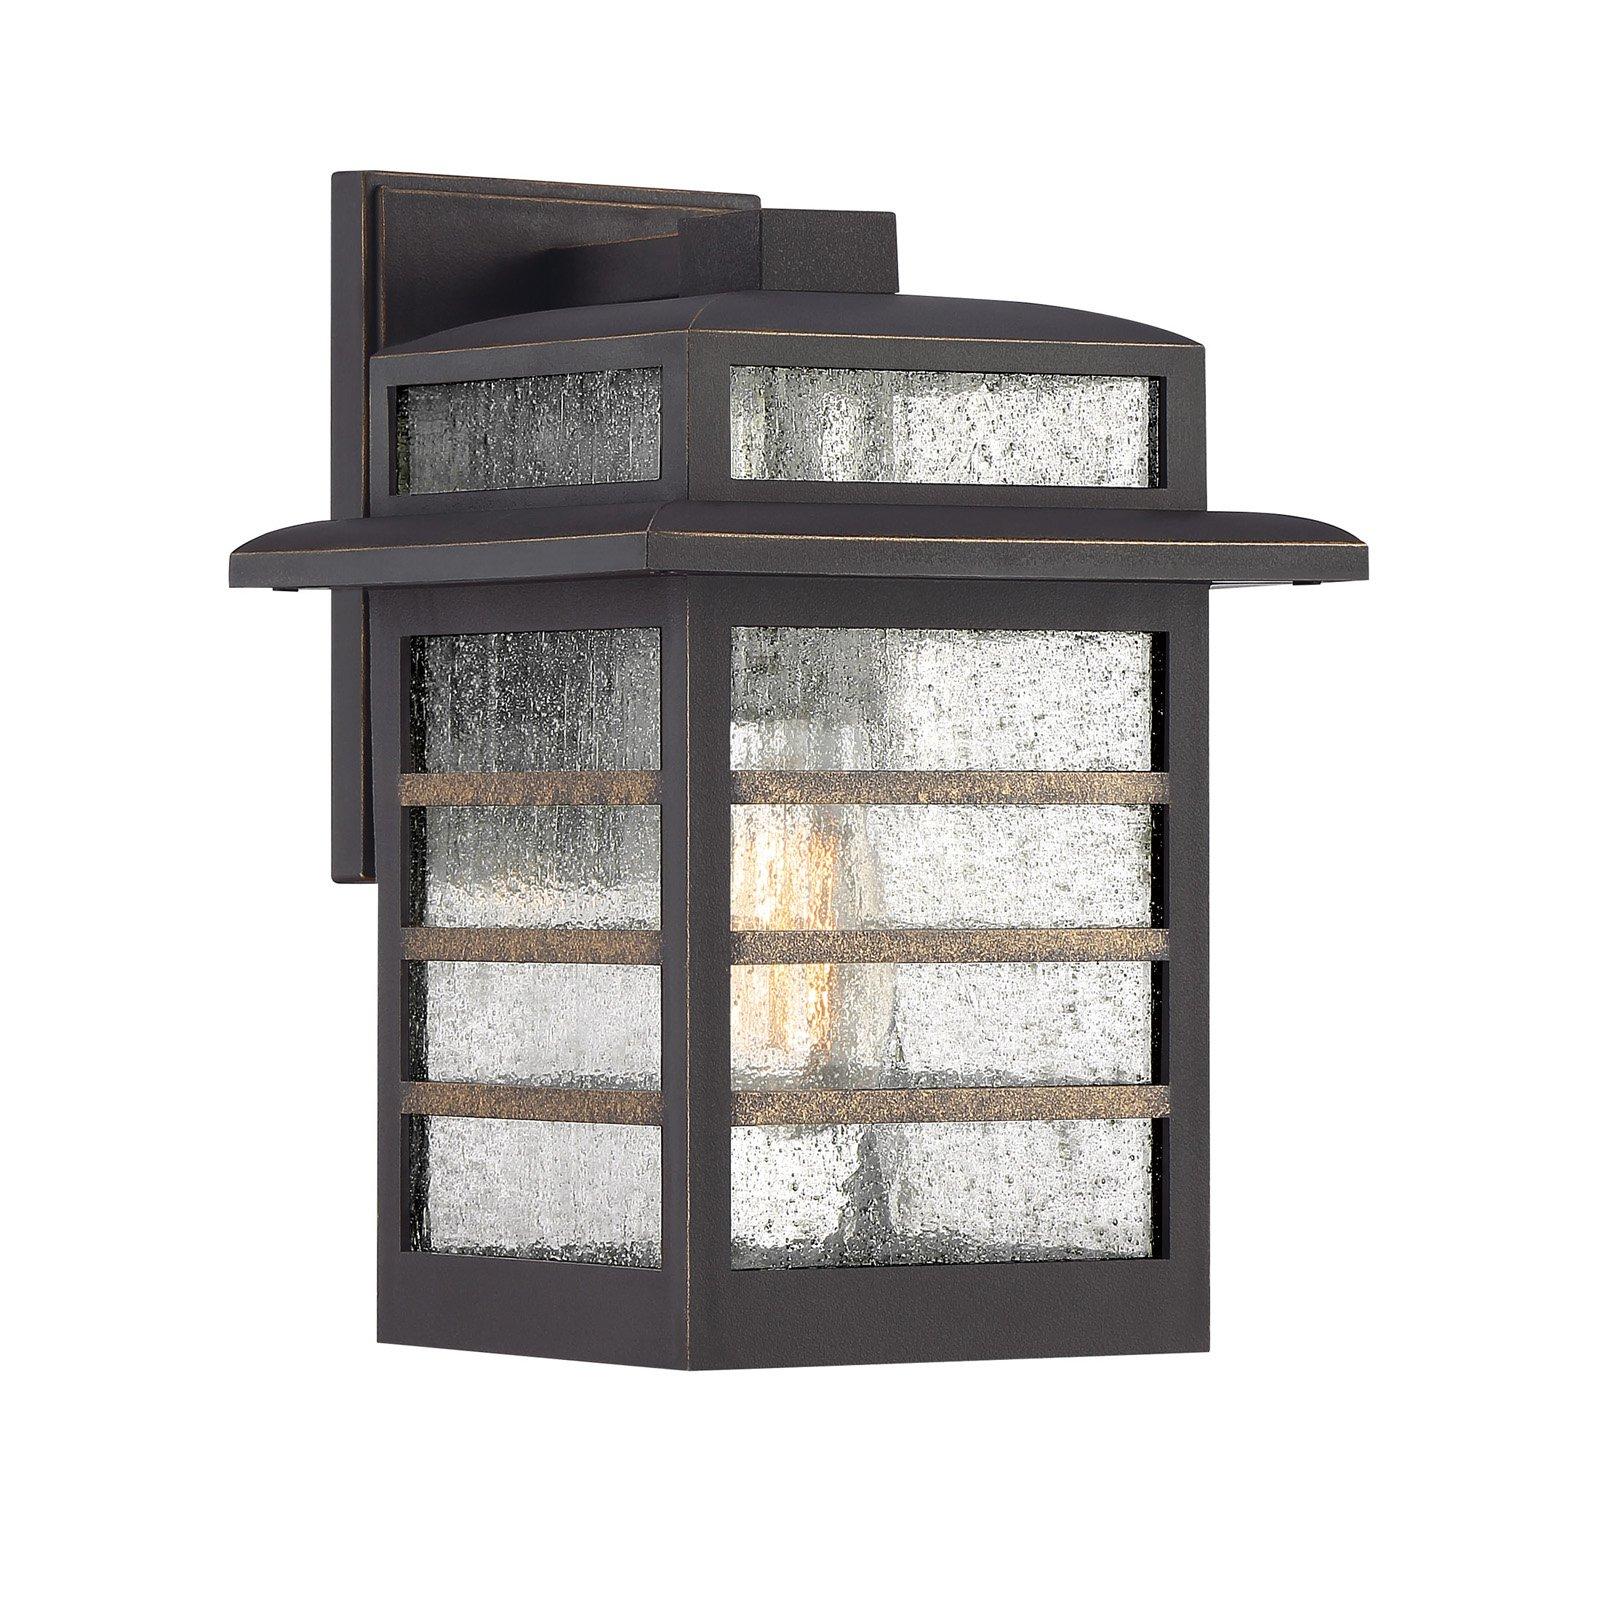 Quoizel Plaza PLA8408PN Outdoor Wall Lantern